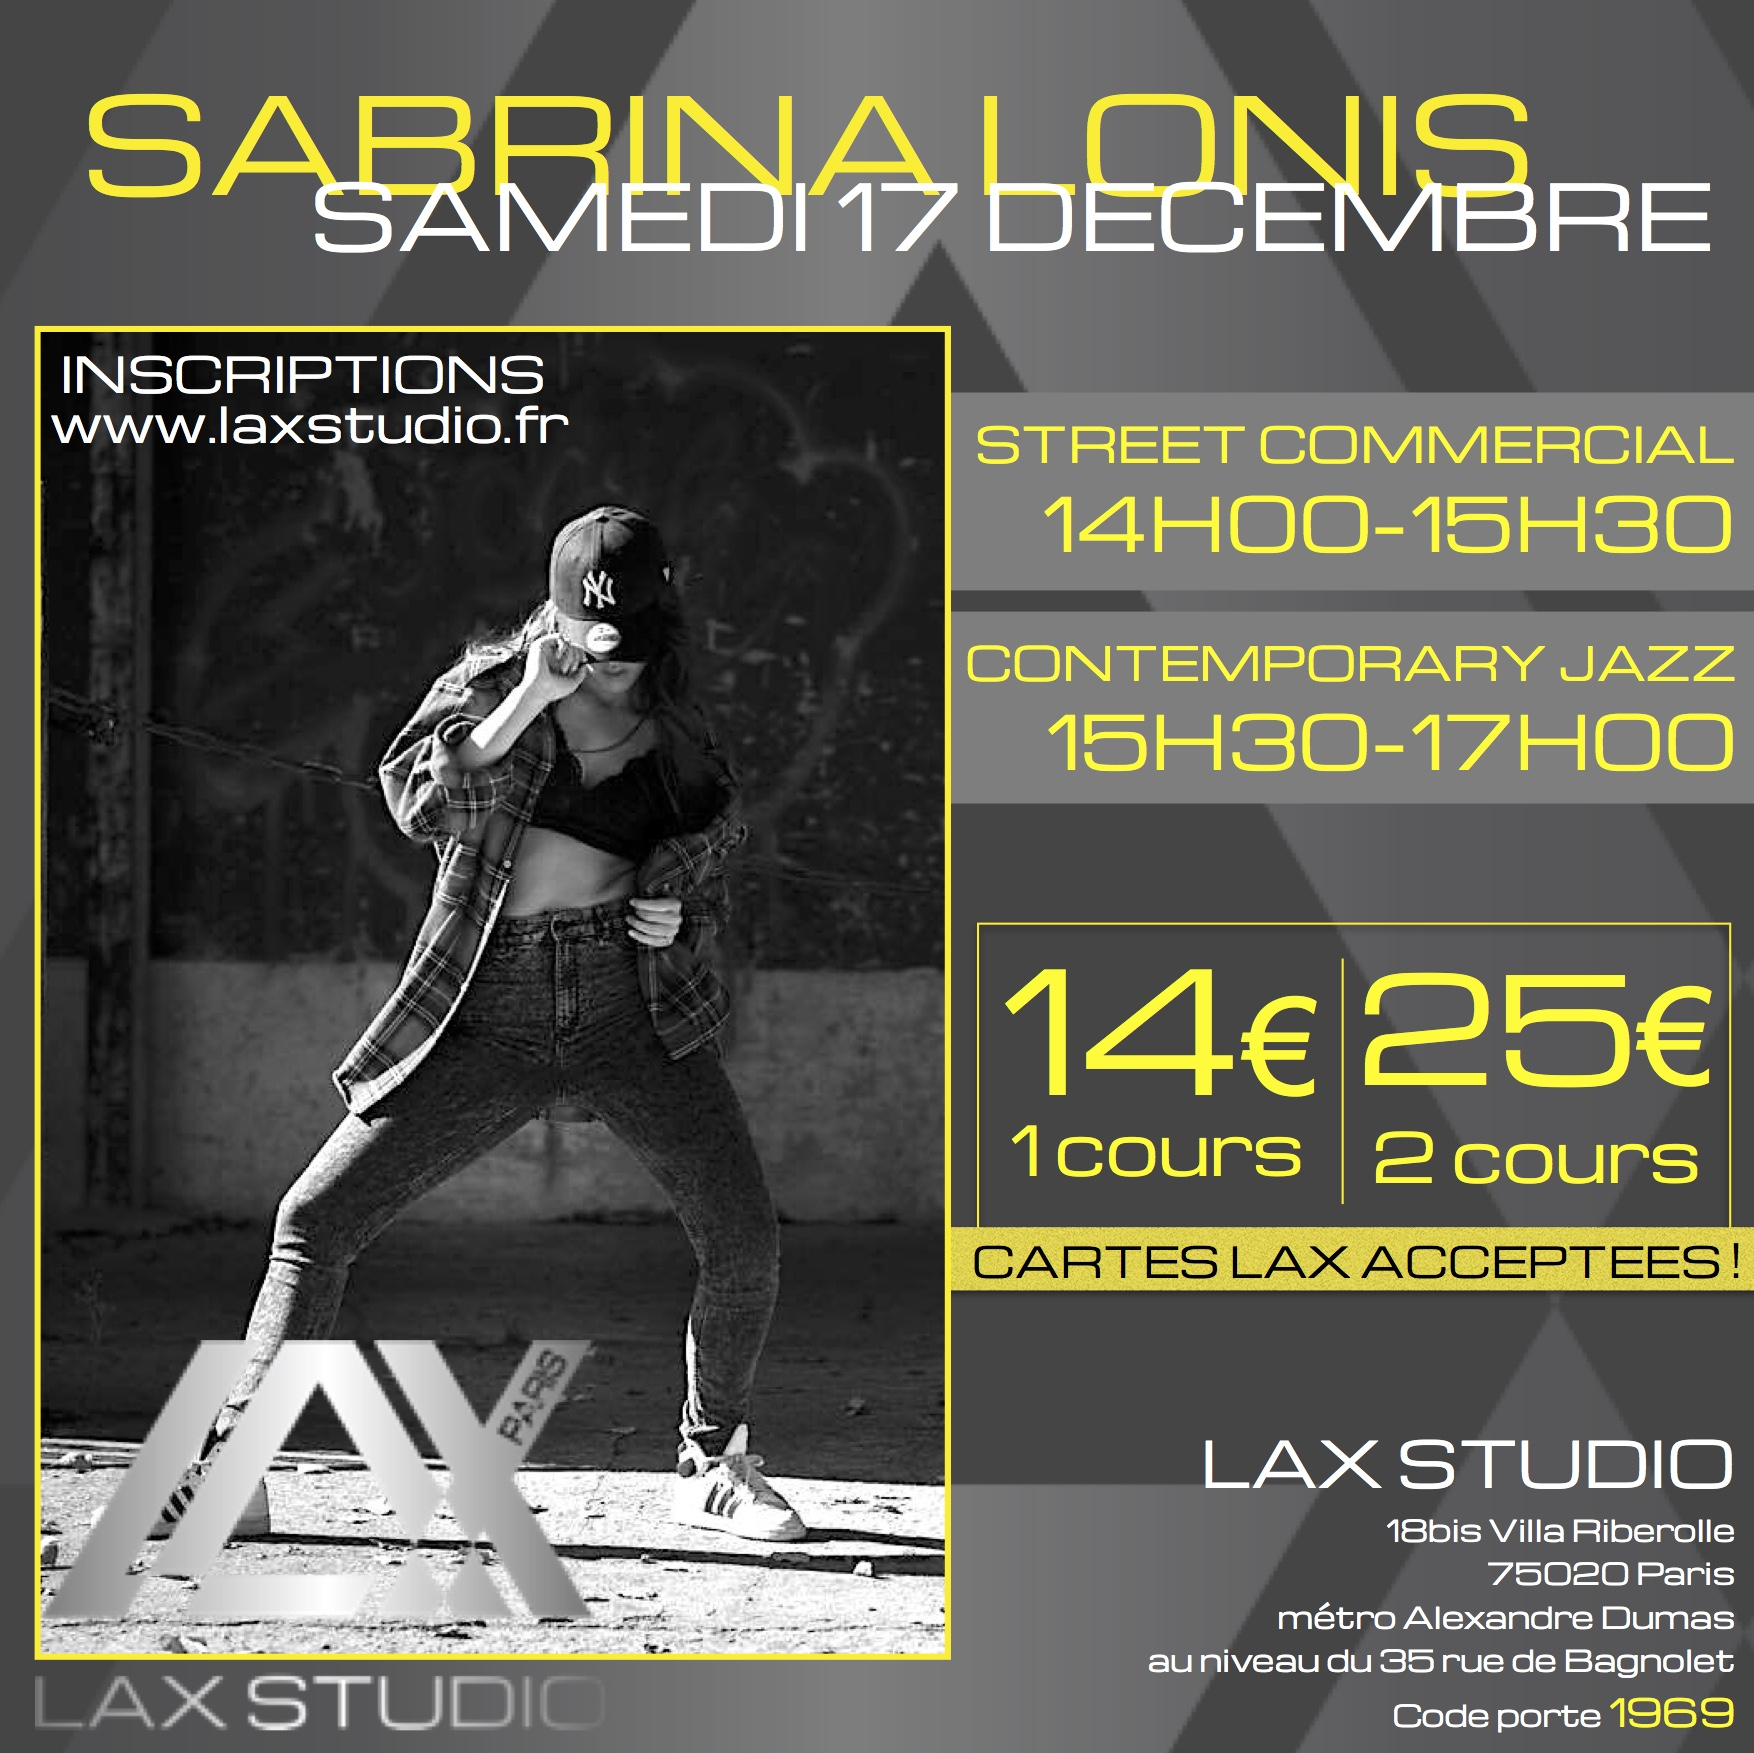 stage avec sabrina lonis le samedi 17 d cembre 2016 lax studio. Black Bedroom Furniture Sets. Home Design Ideas